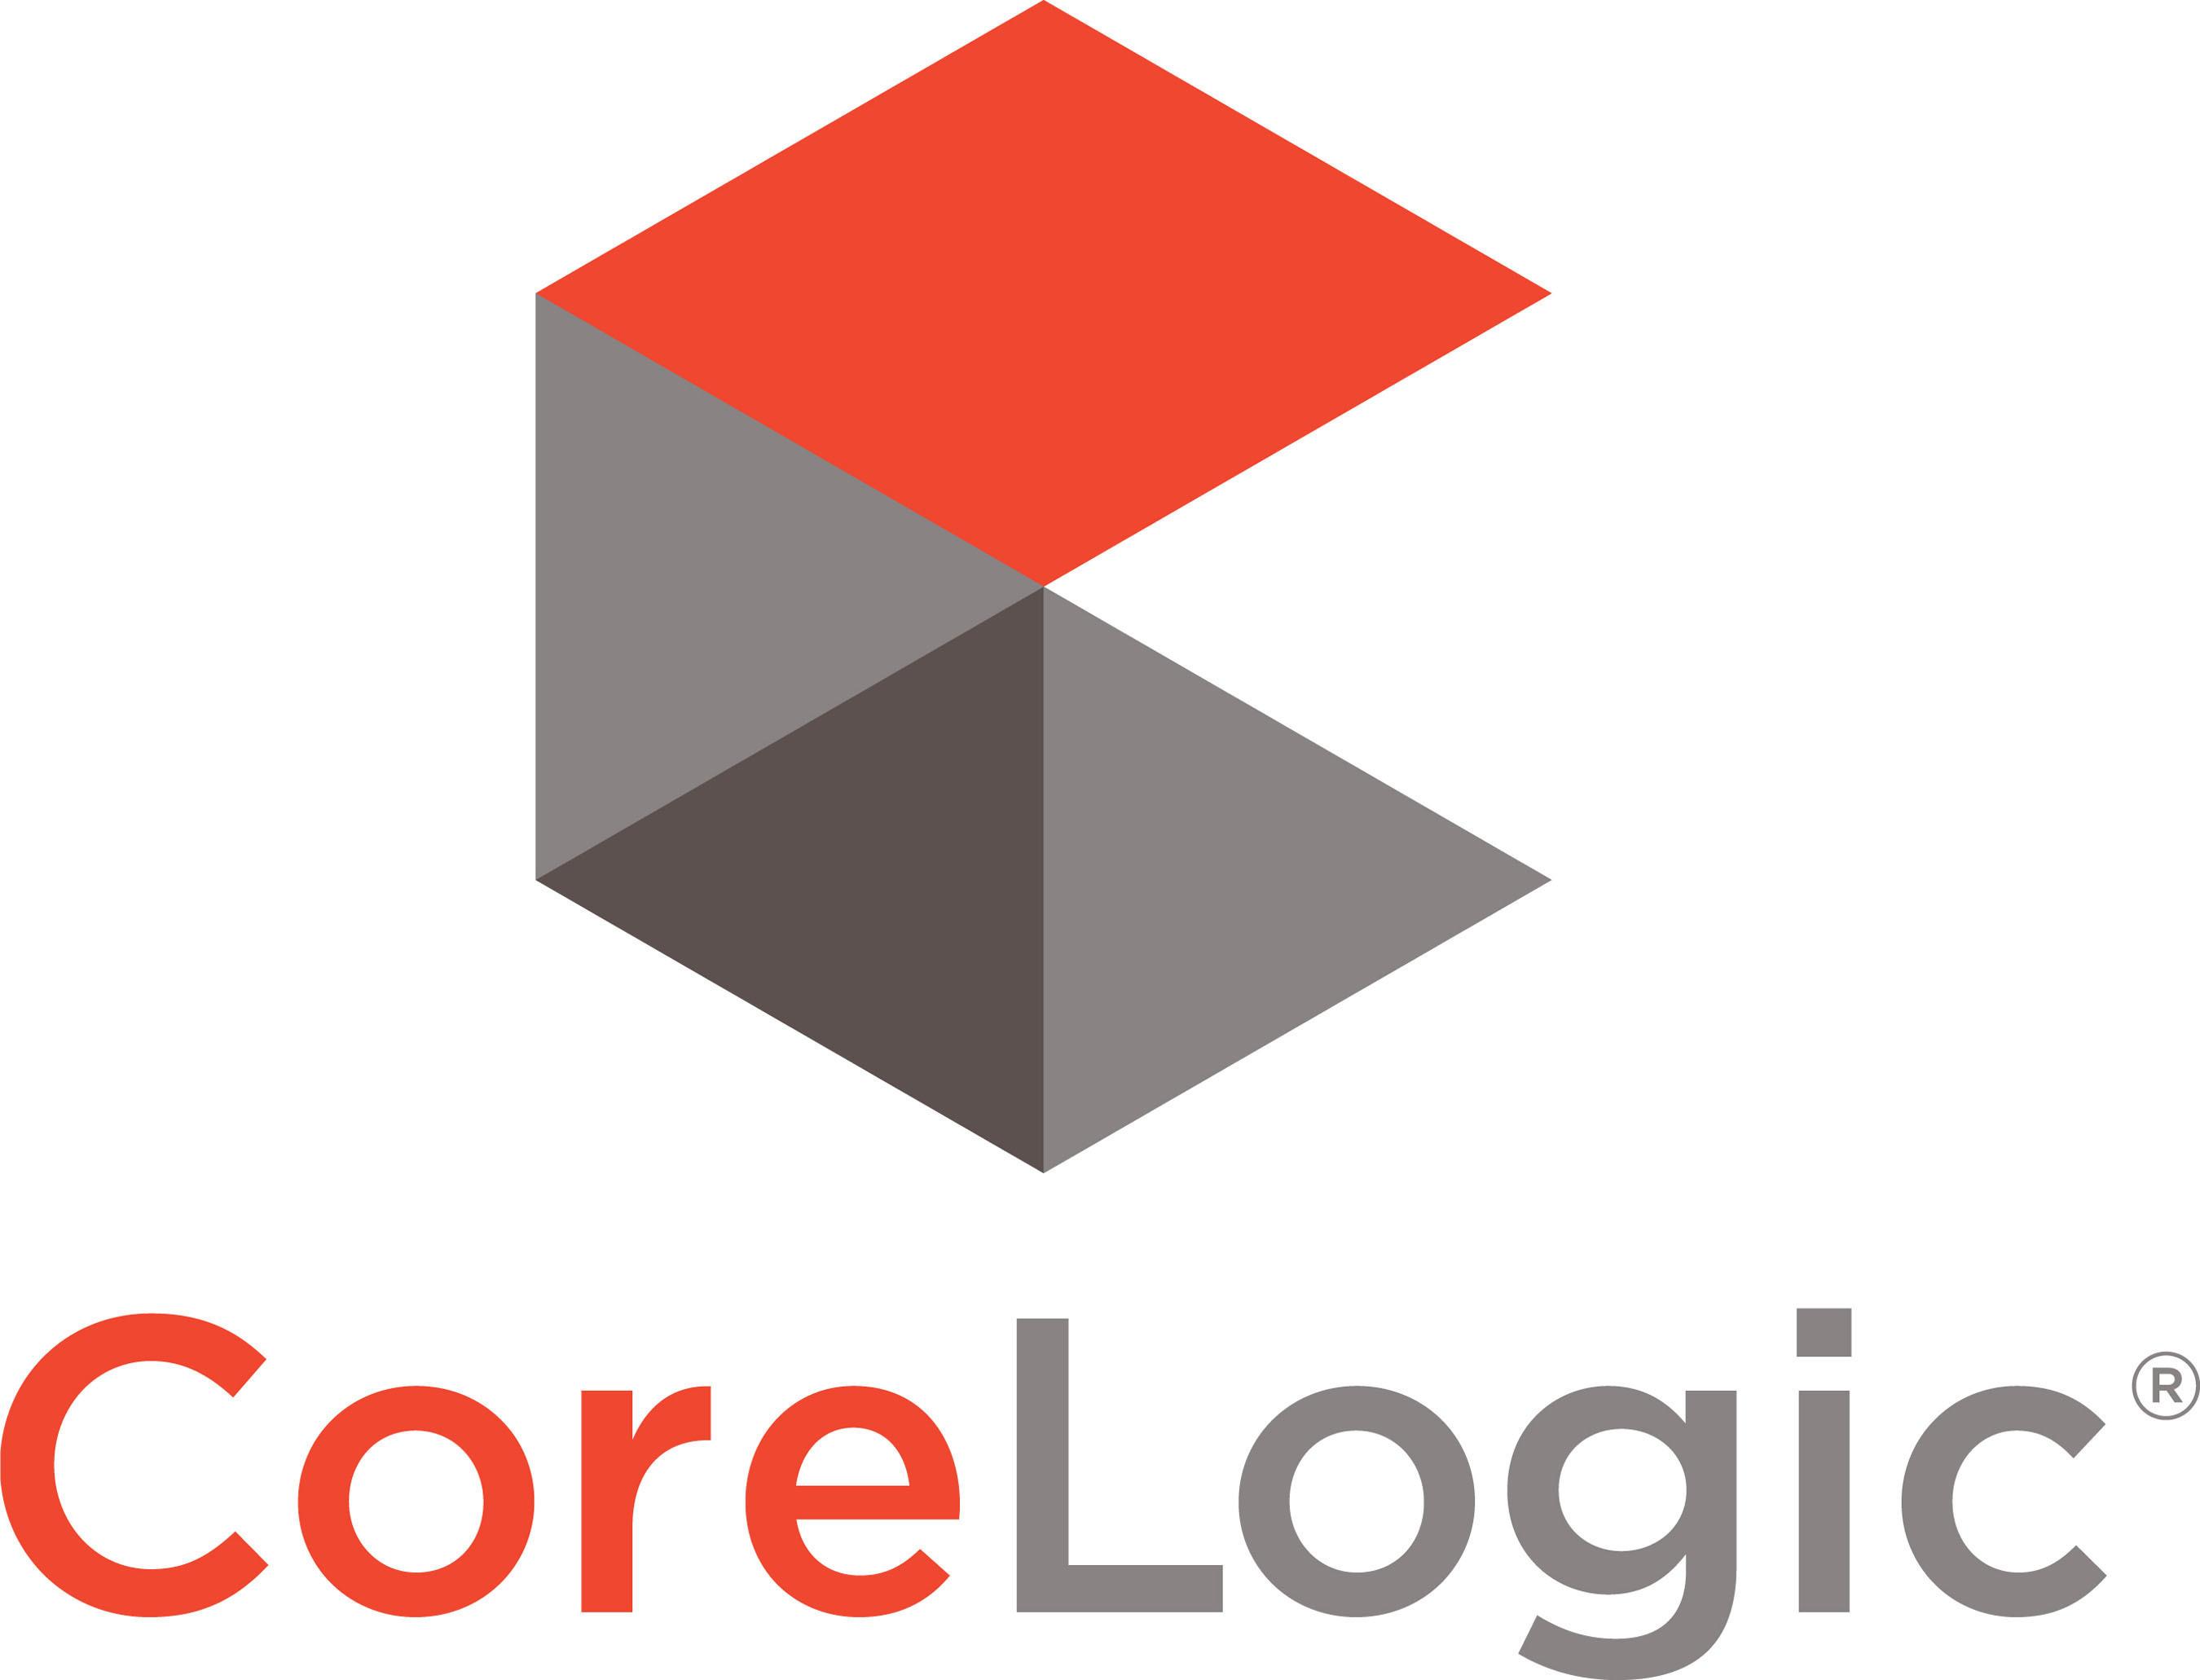 CoreLogic, A Real Estate Data and Analytics Company.